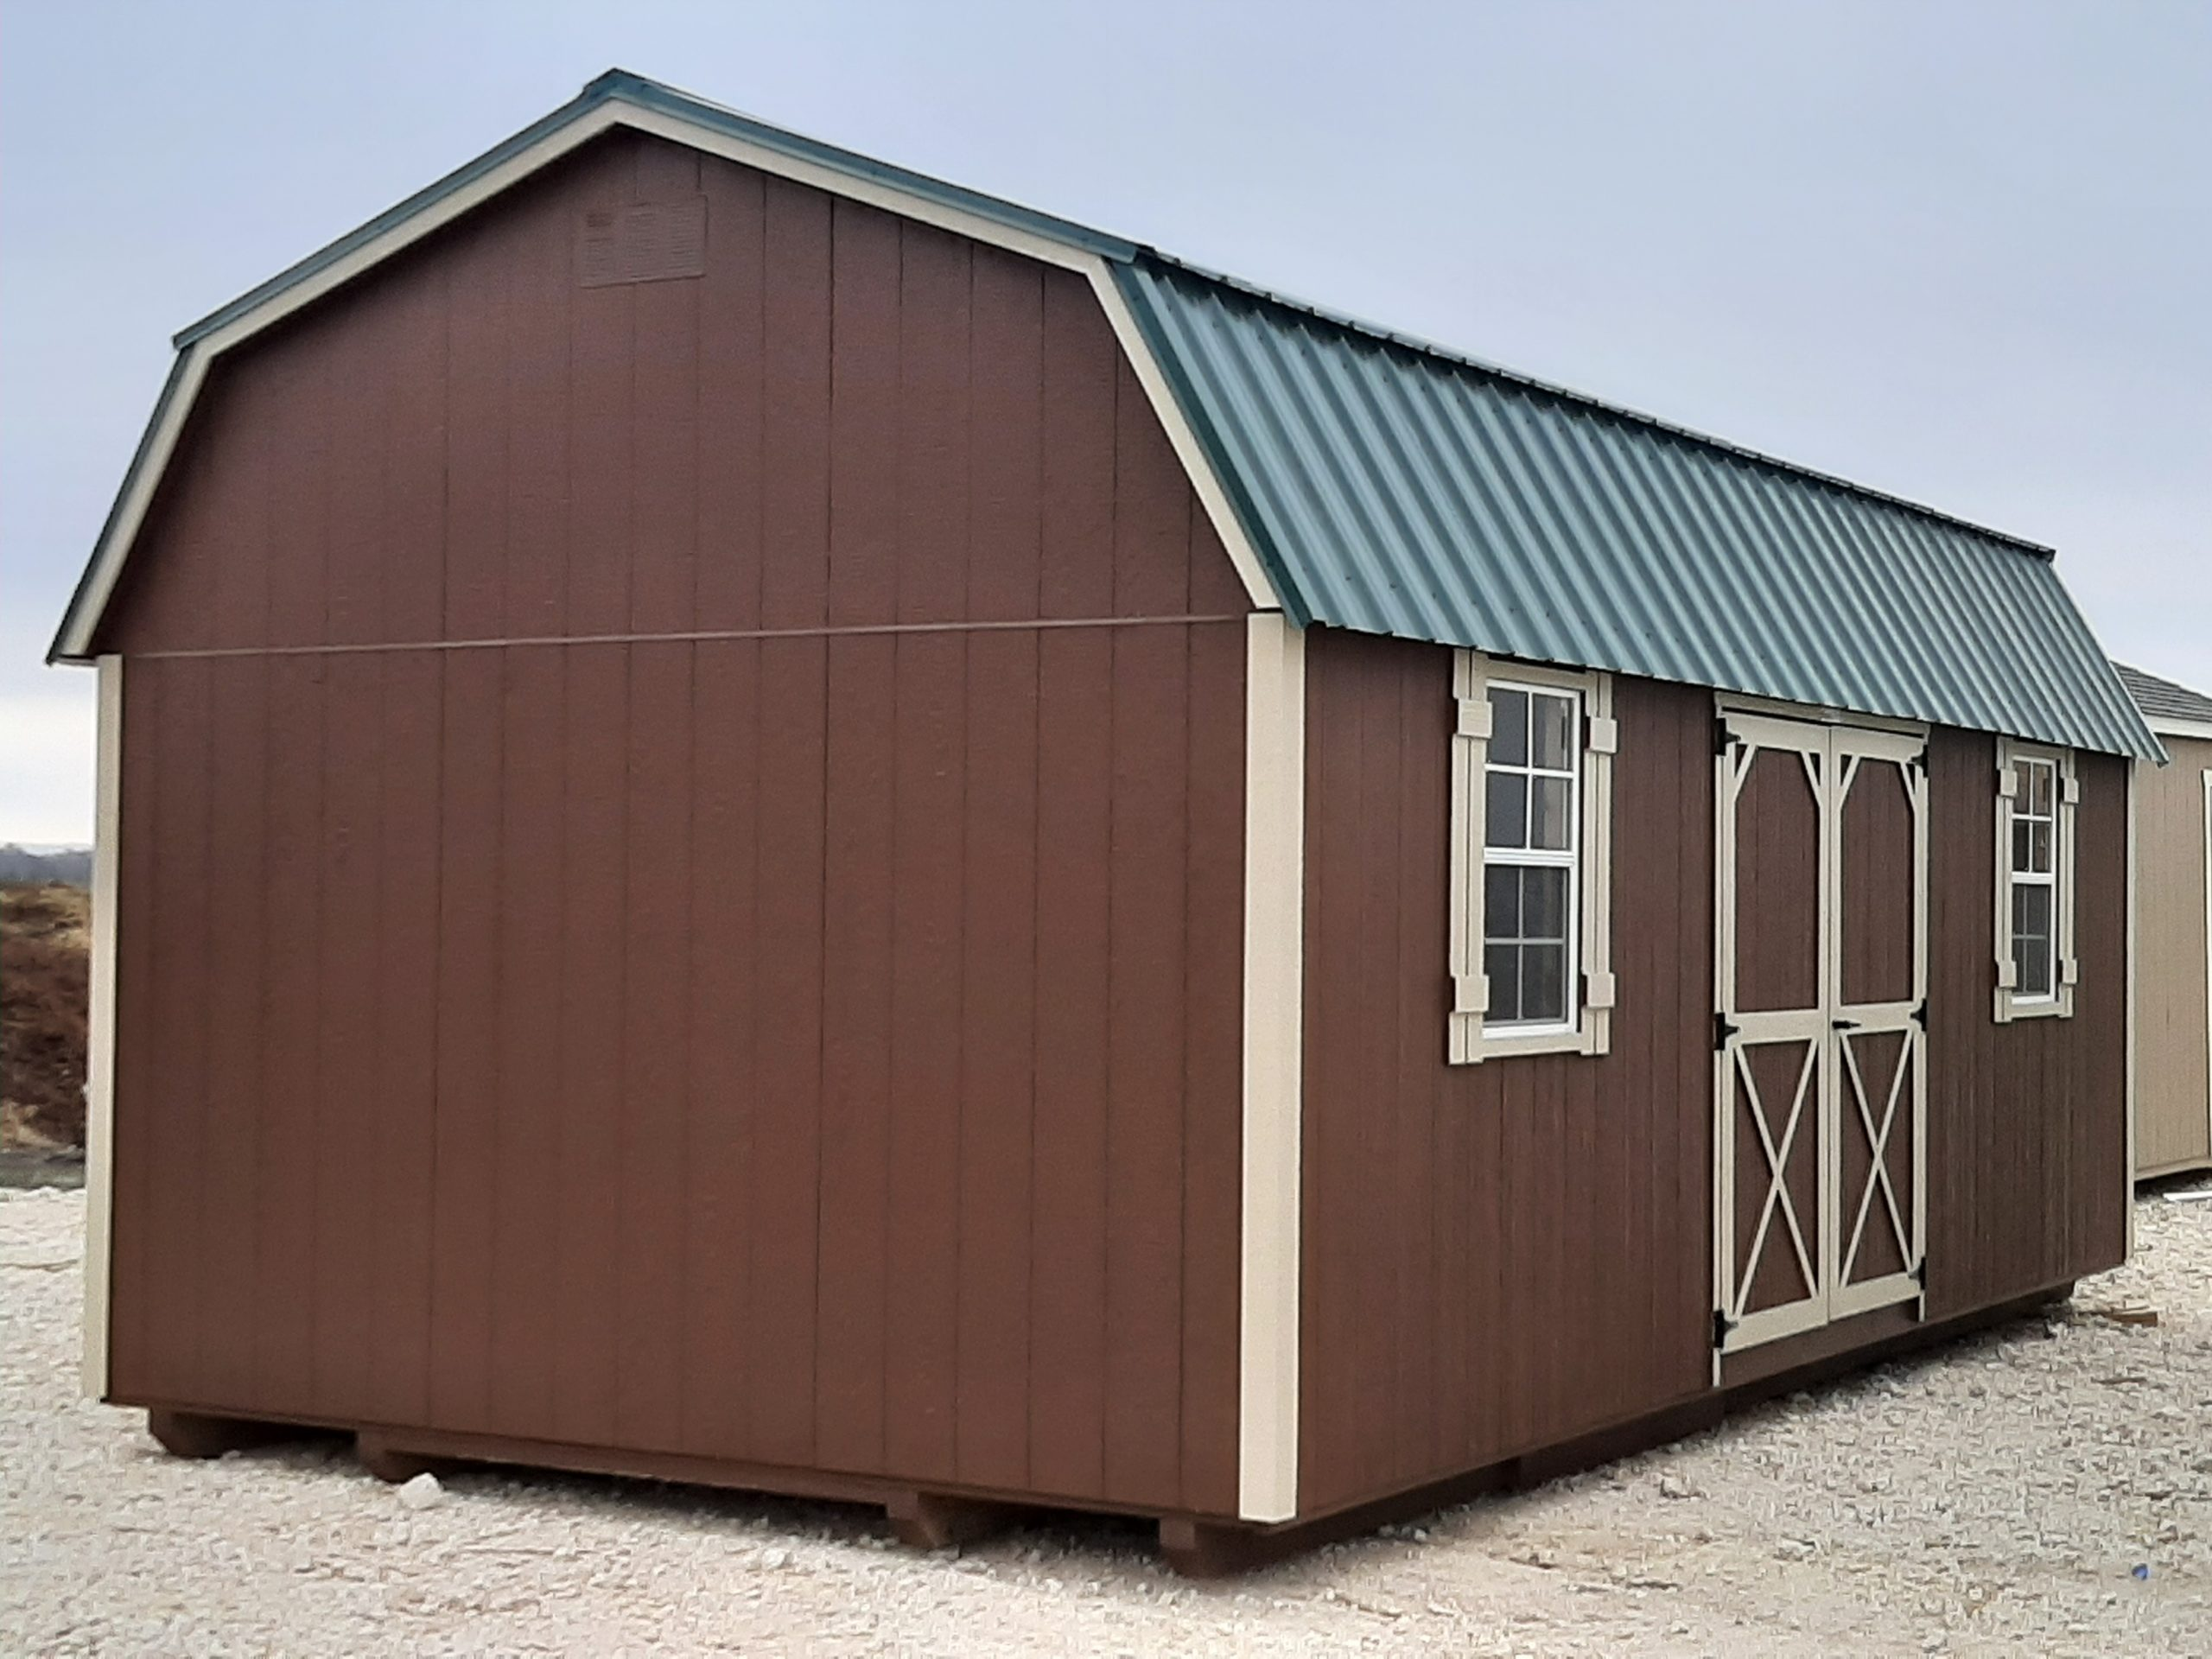 12x24 Elite Lofted Barn Image